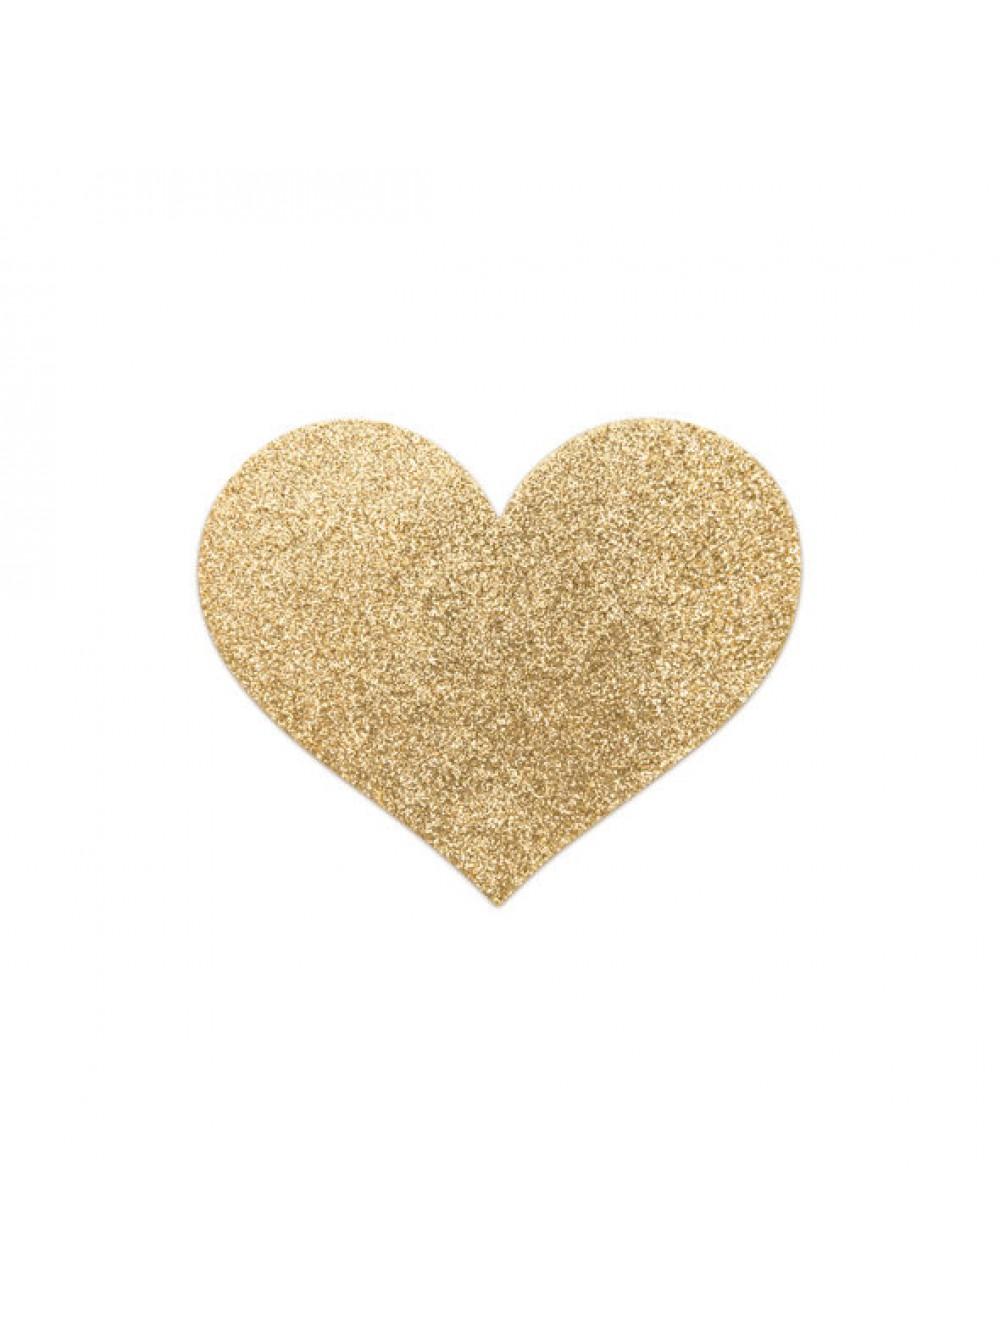 BIJOUX INDISCRETS FLASH HEART GOLD 8437008002798